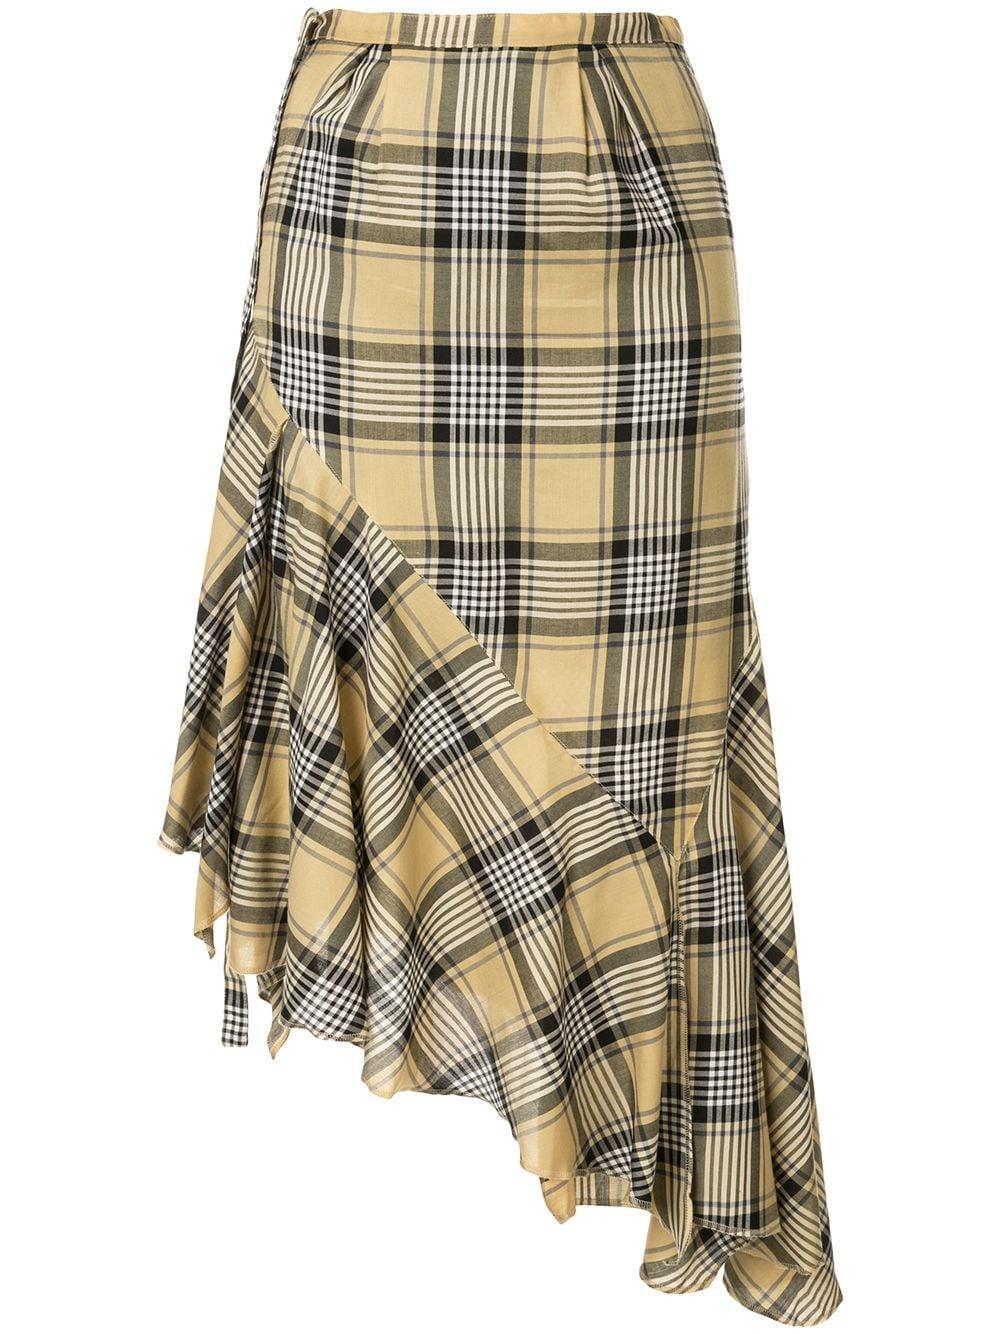 Maison Mihara Yasuhiro юбка в клетку с запахом